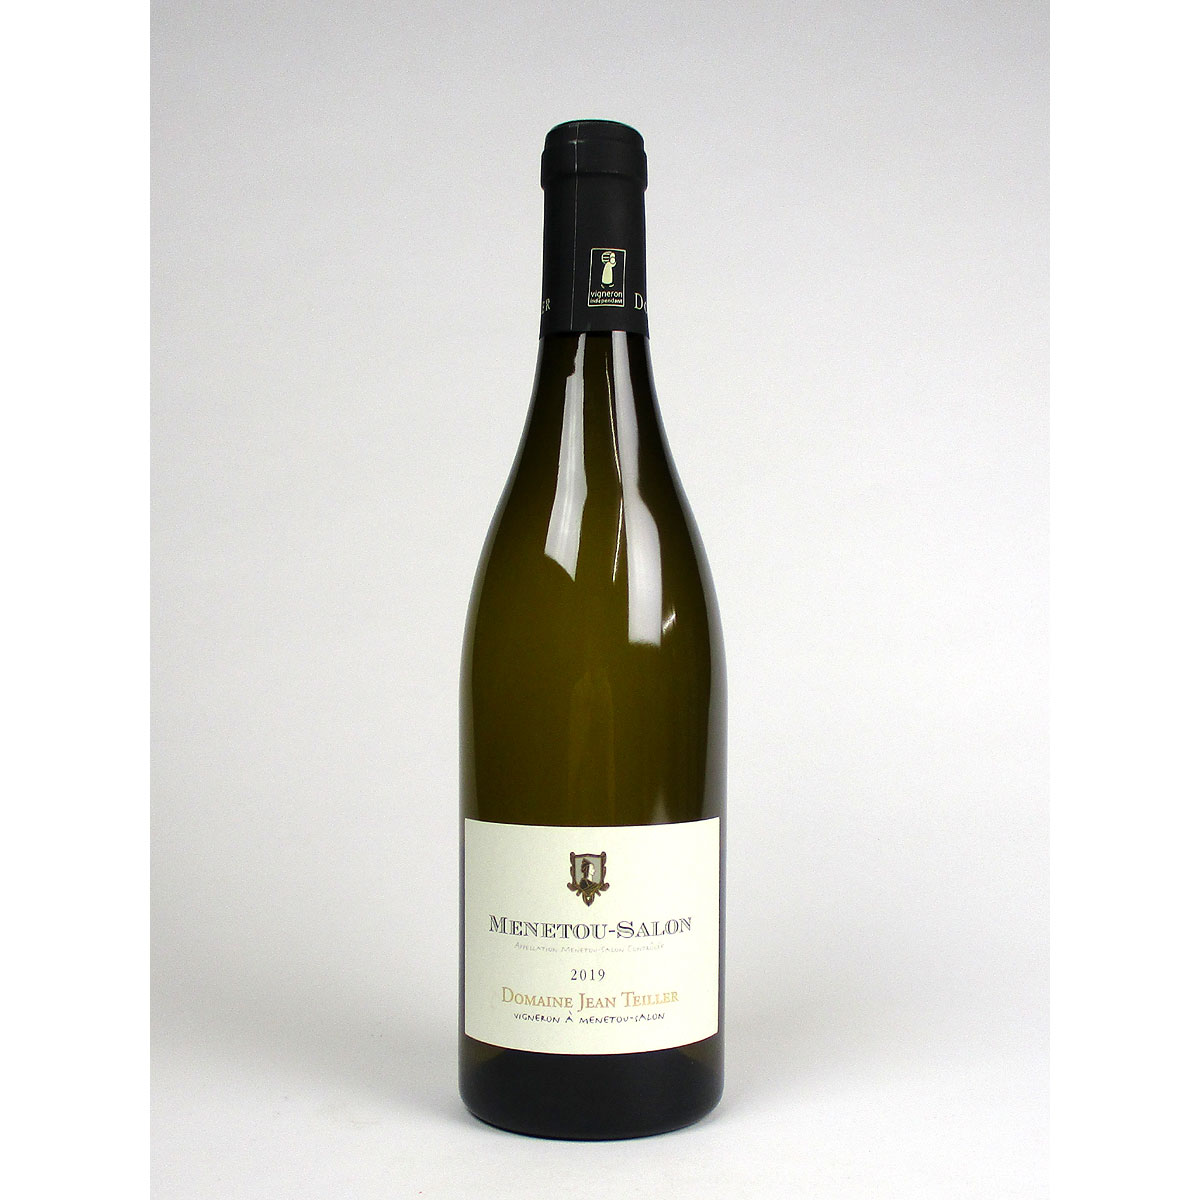 Menetou Salon: Domaine Jean Teiller Blanc 2019 - Bottle